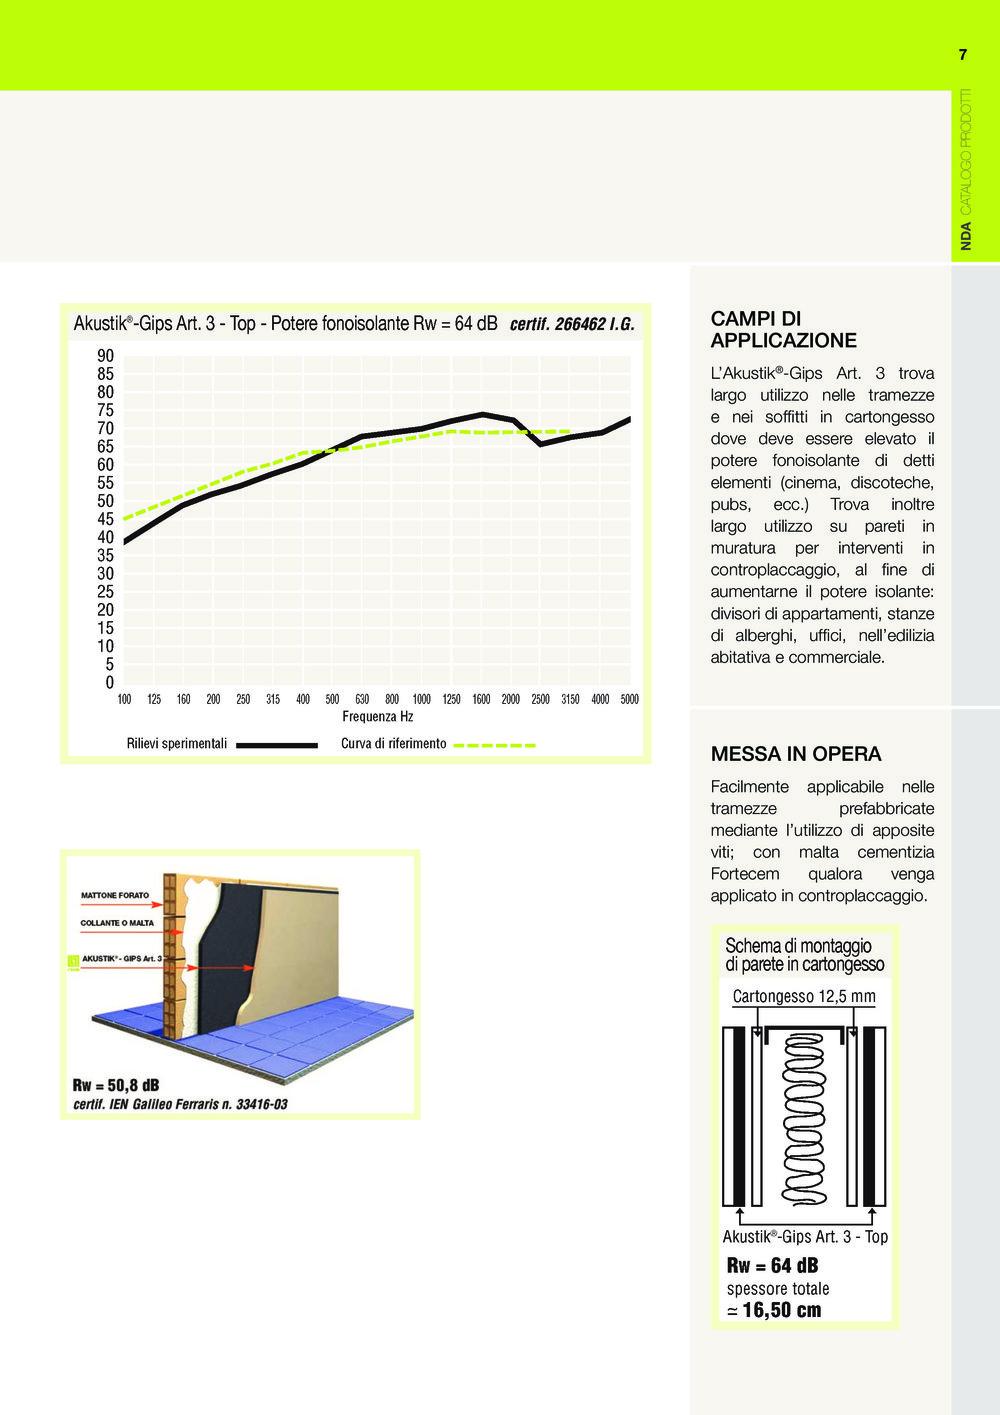 AKUSTIK ® - GIPS ART. 3